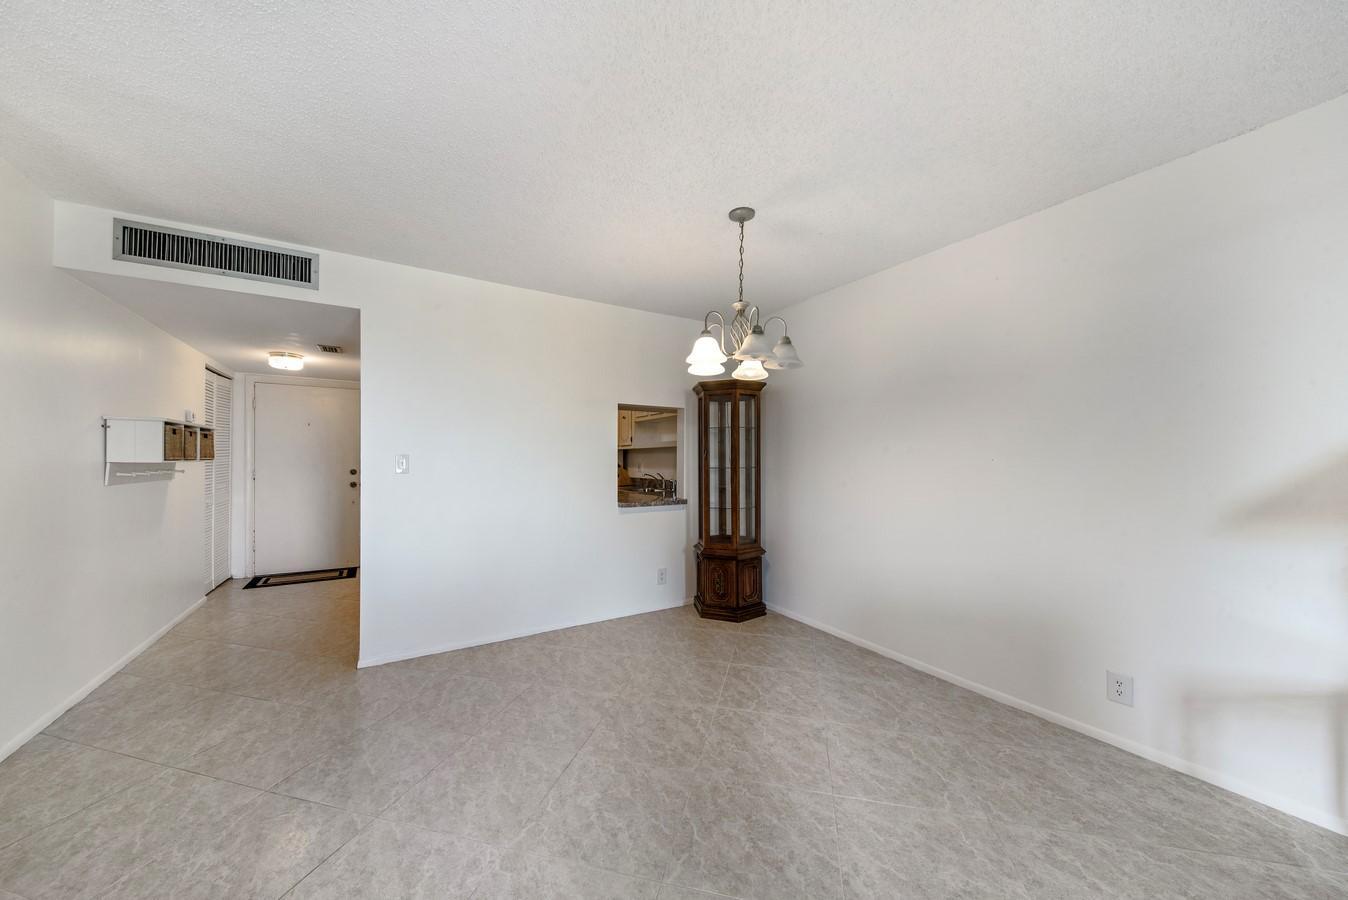 6161 NW 2nd Avenue 422 Boca Raton, FL 33487 photo 4